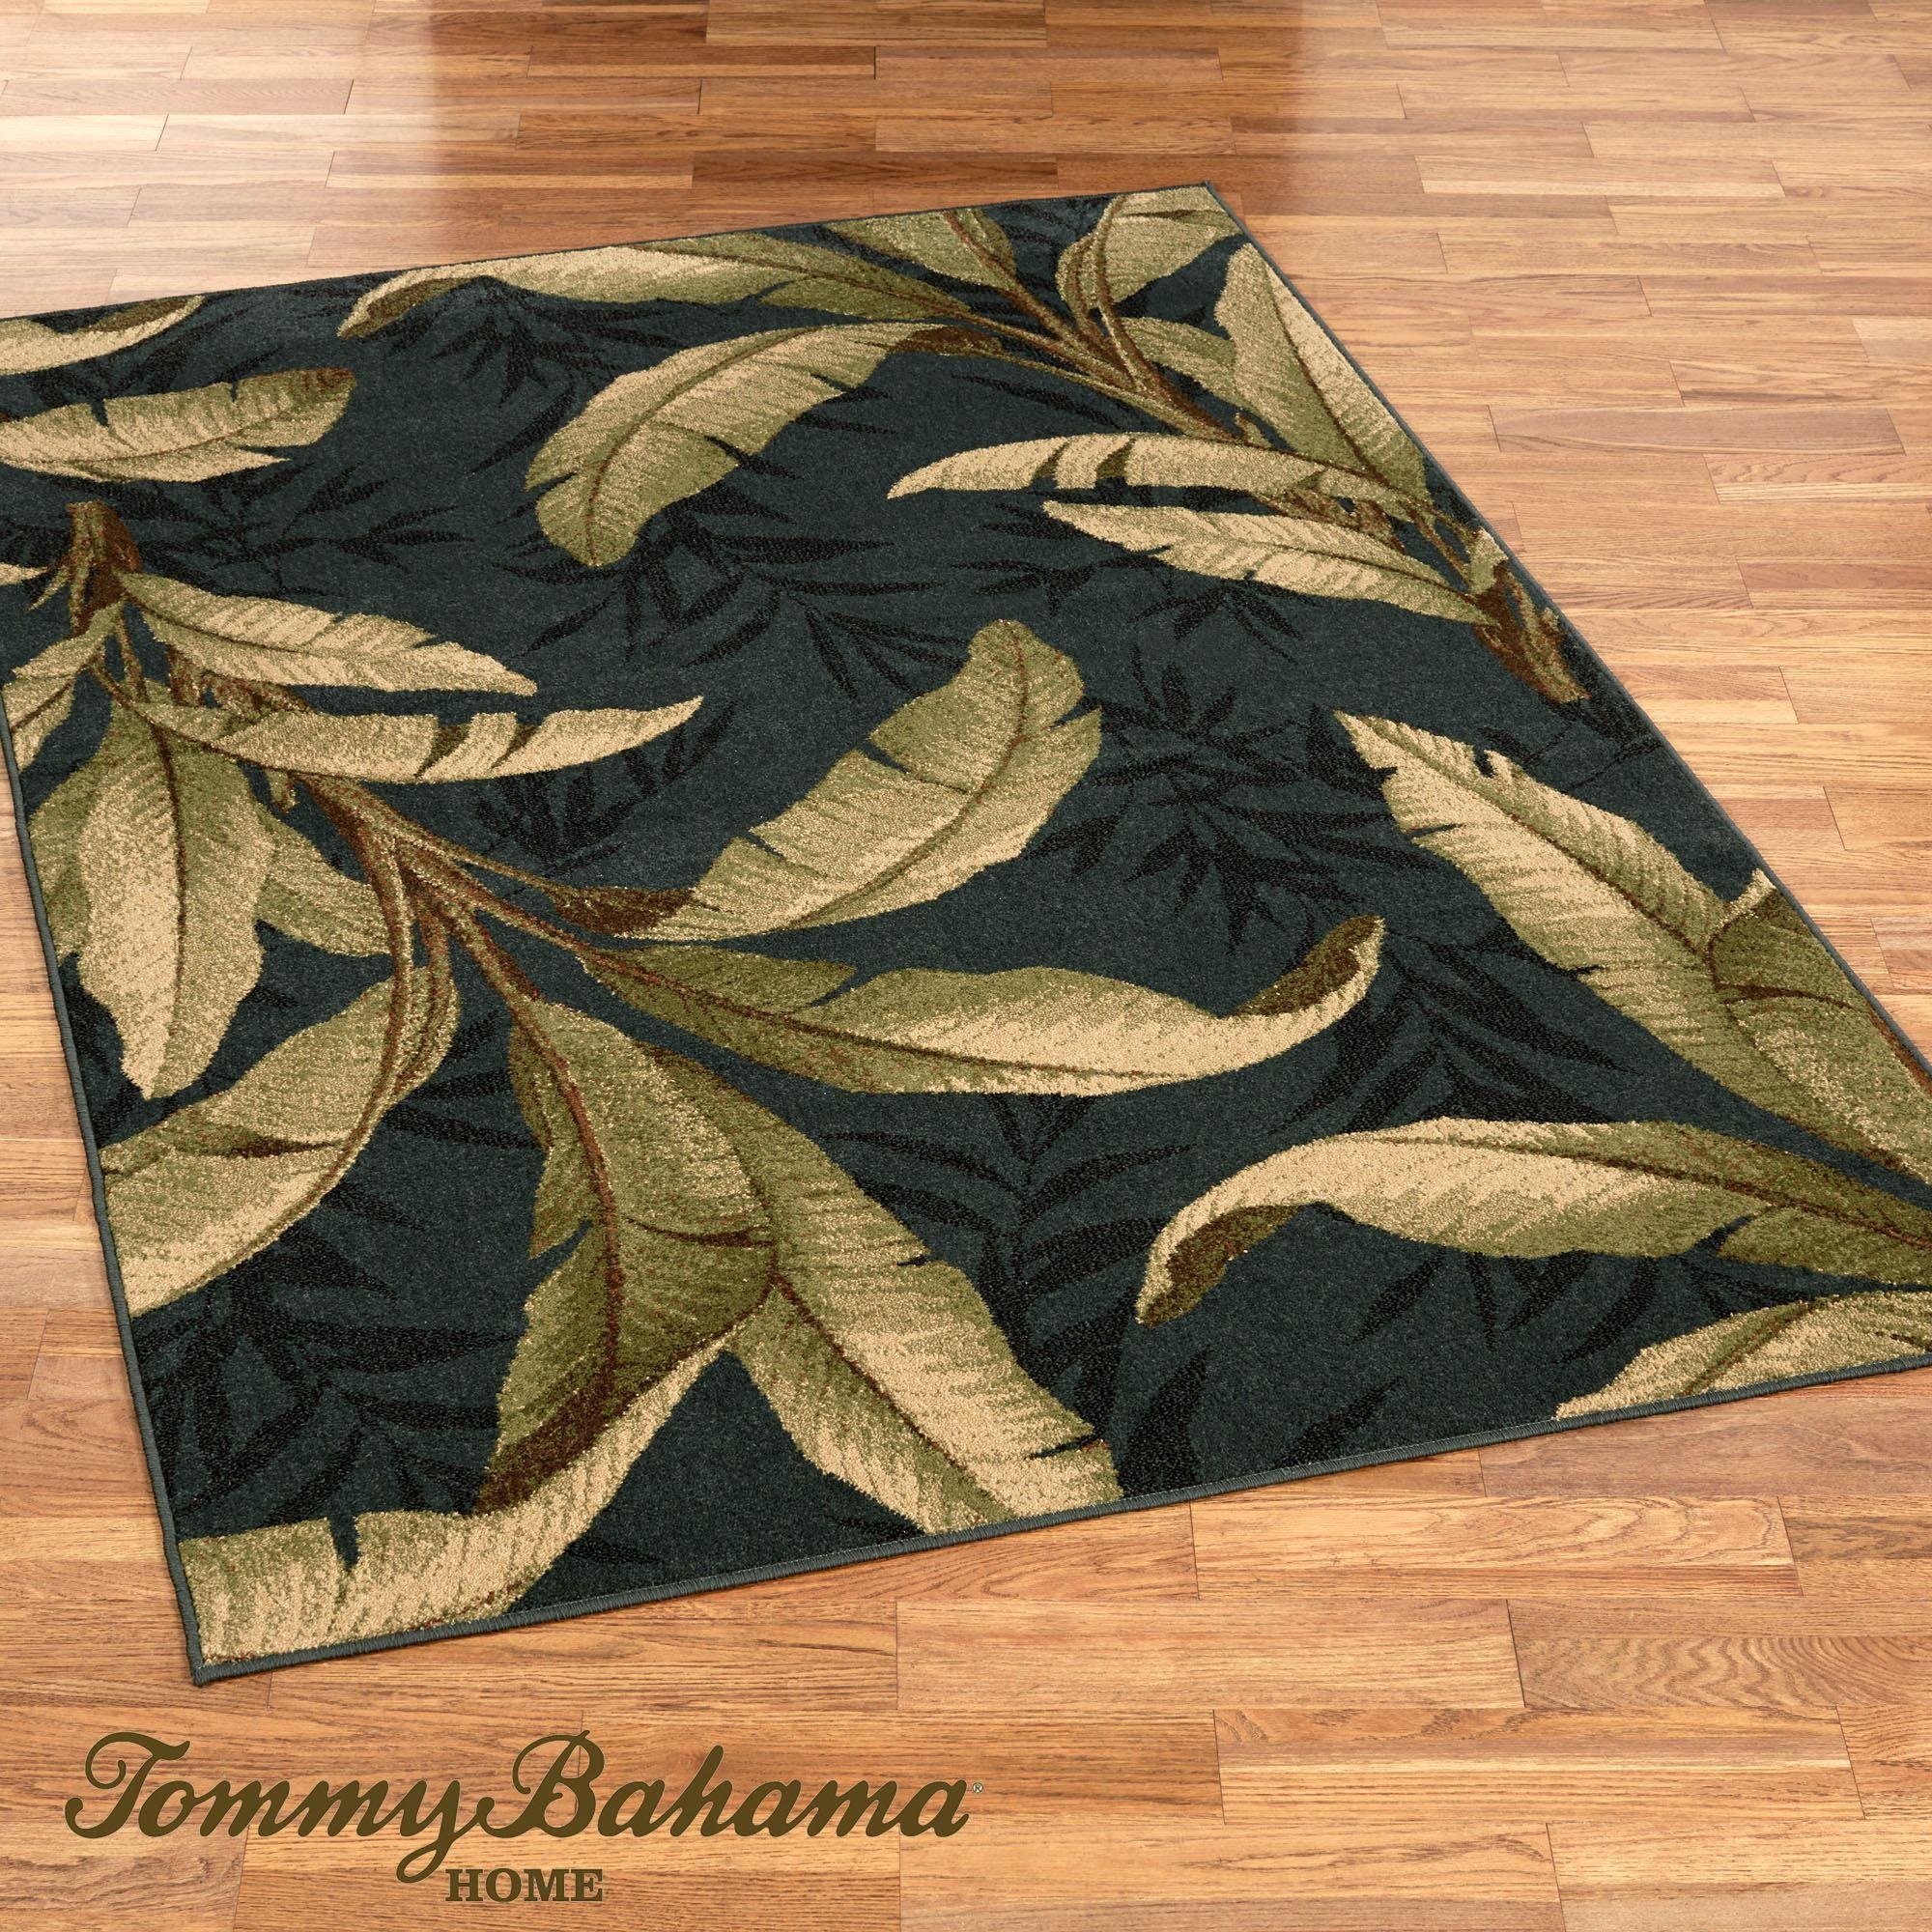 Tommy Bahama Rugs Palm Trees Bindu Bhatia Astrology